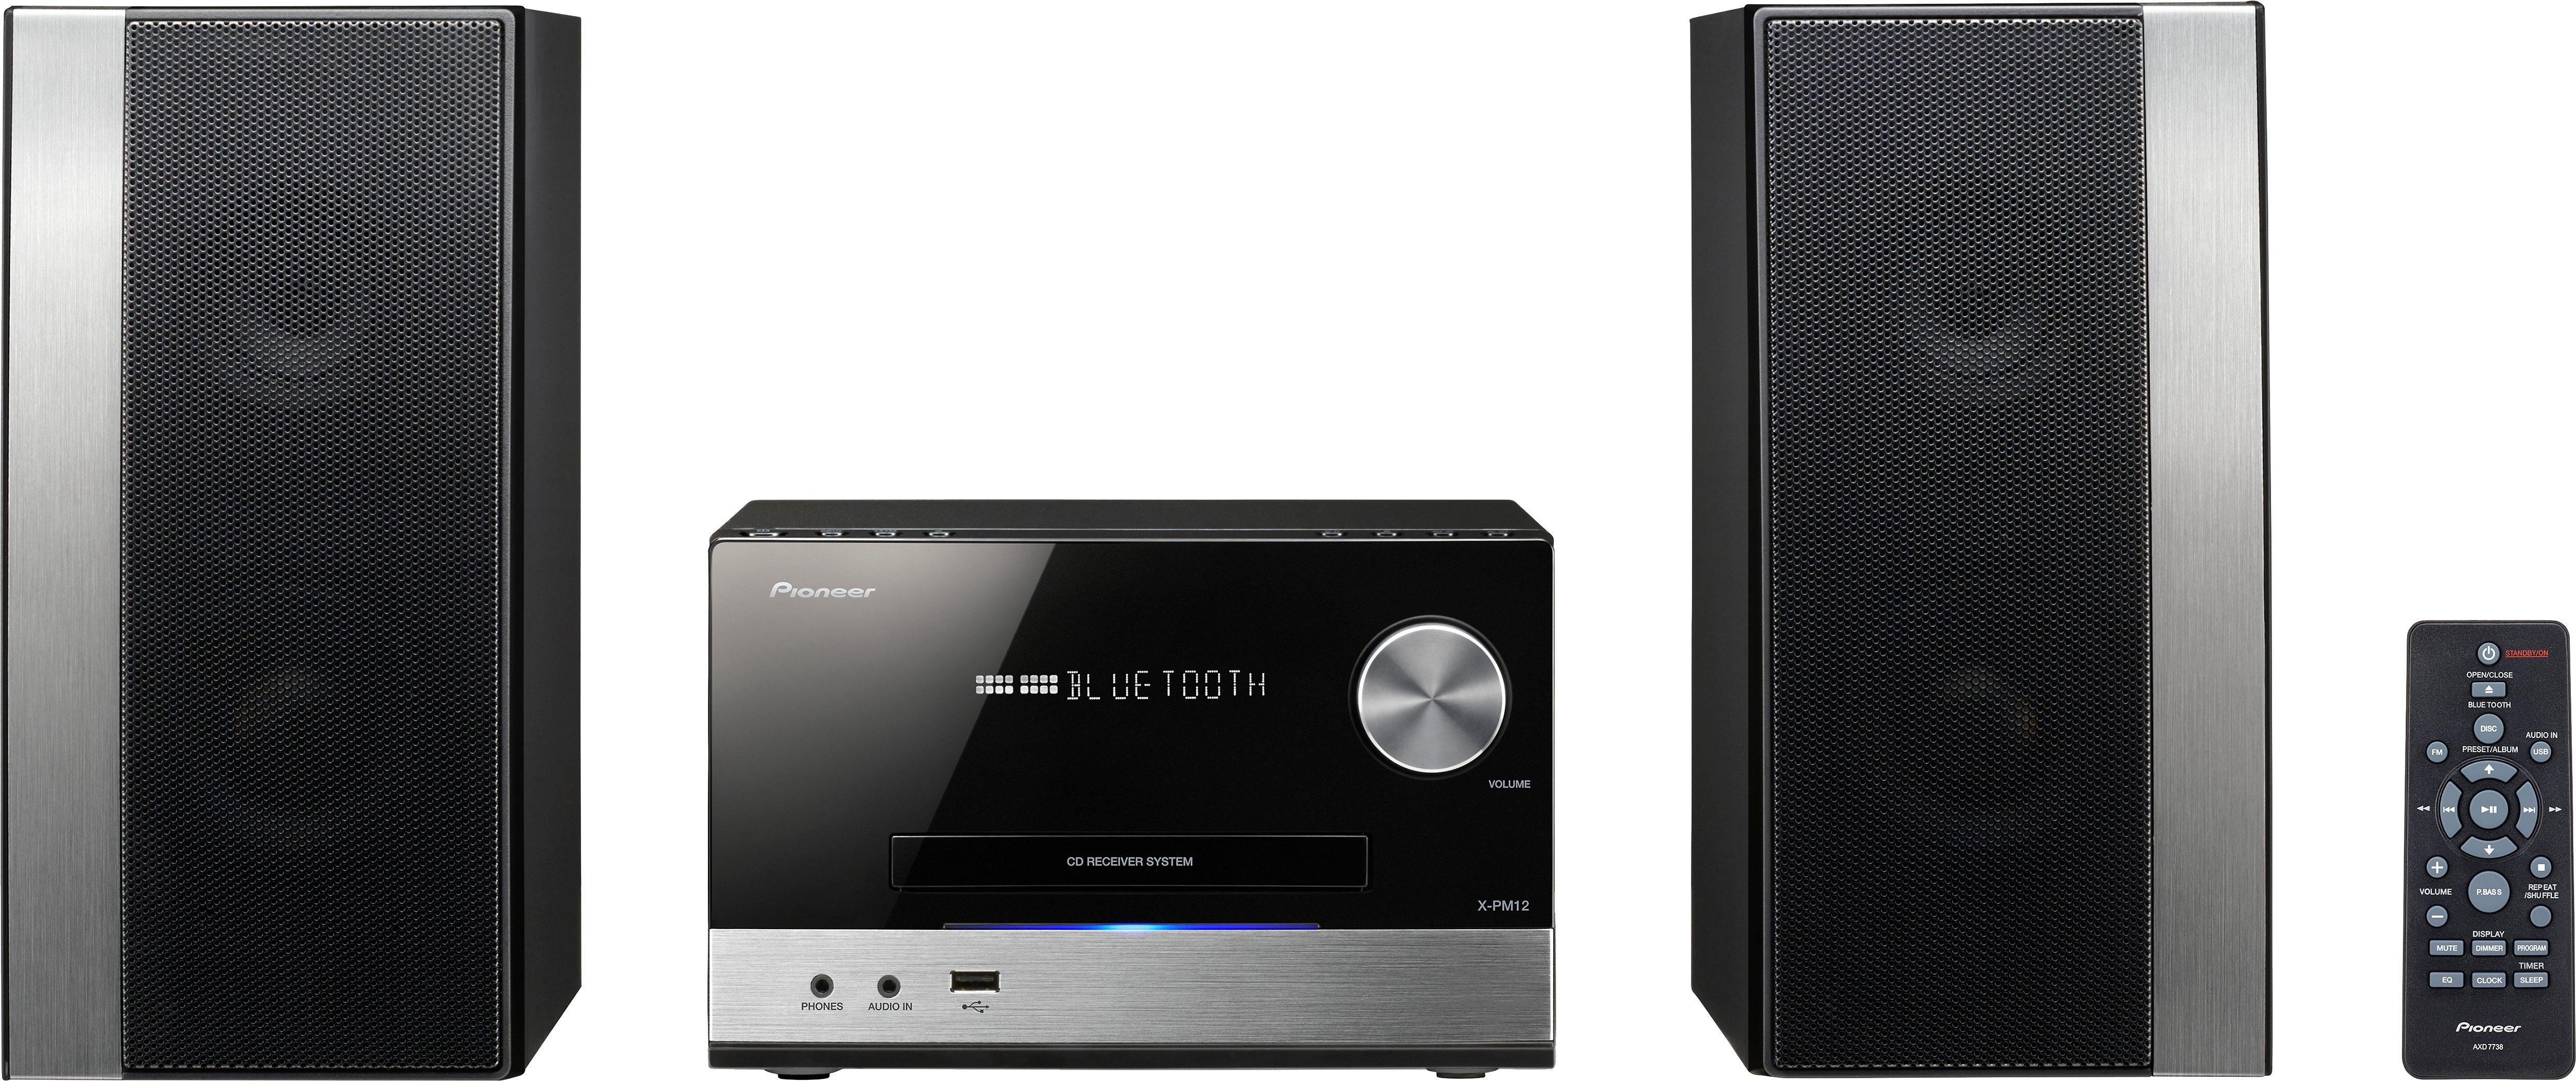 Pioneer X-PM12 Microanlage, Bluetooth, RDS, 1x USB